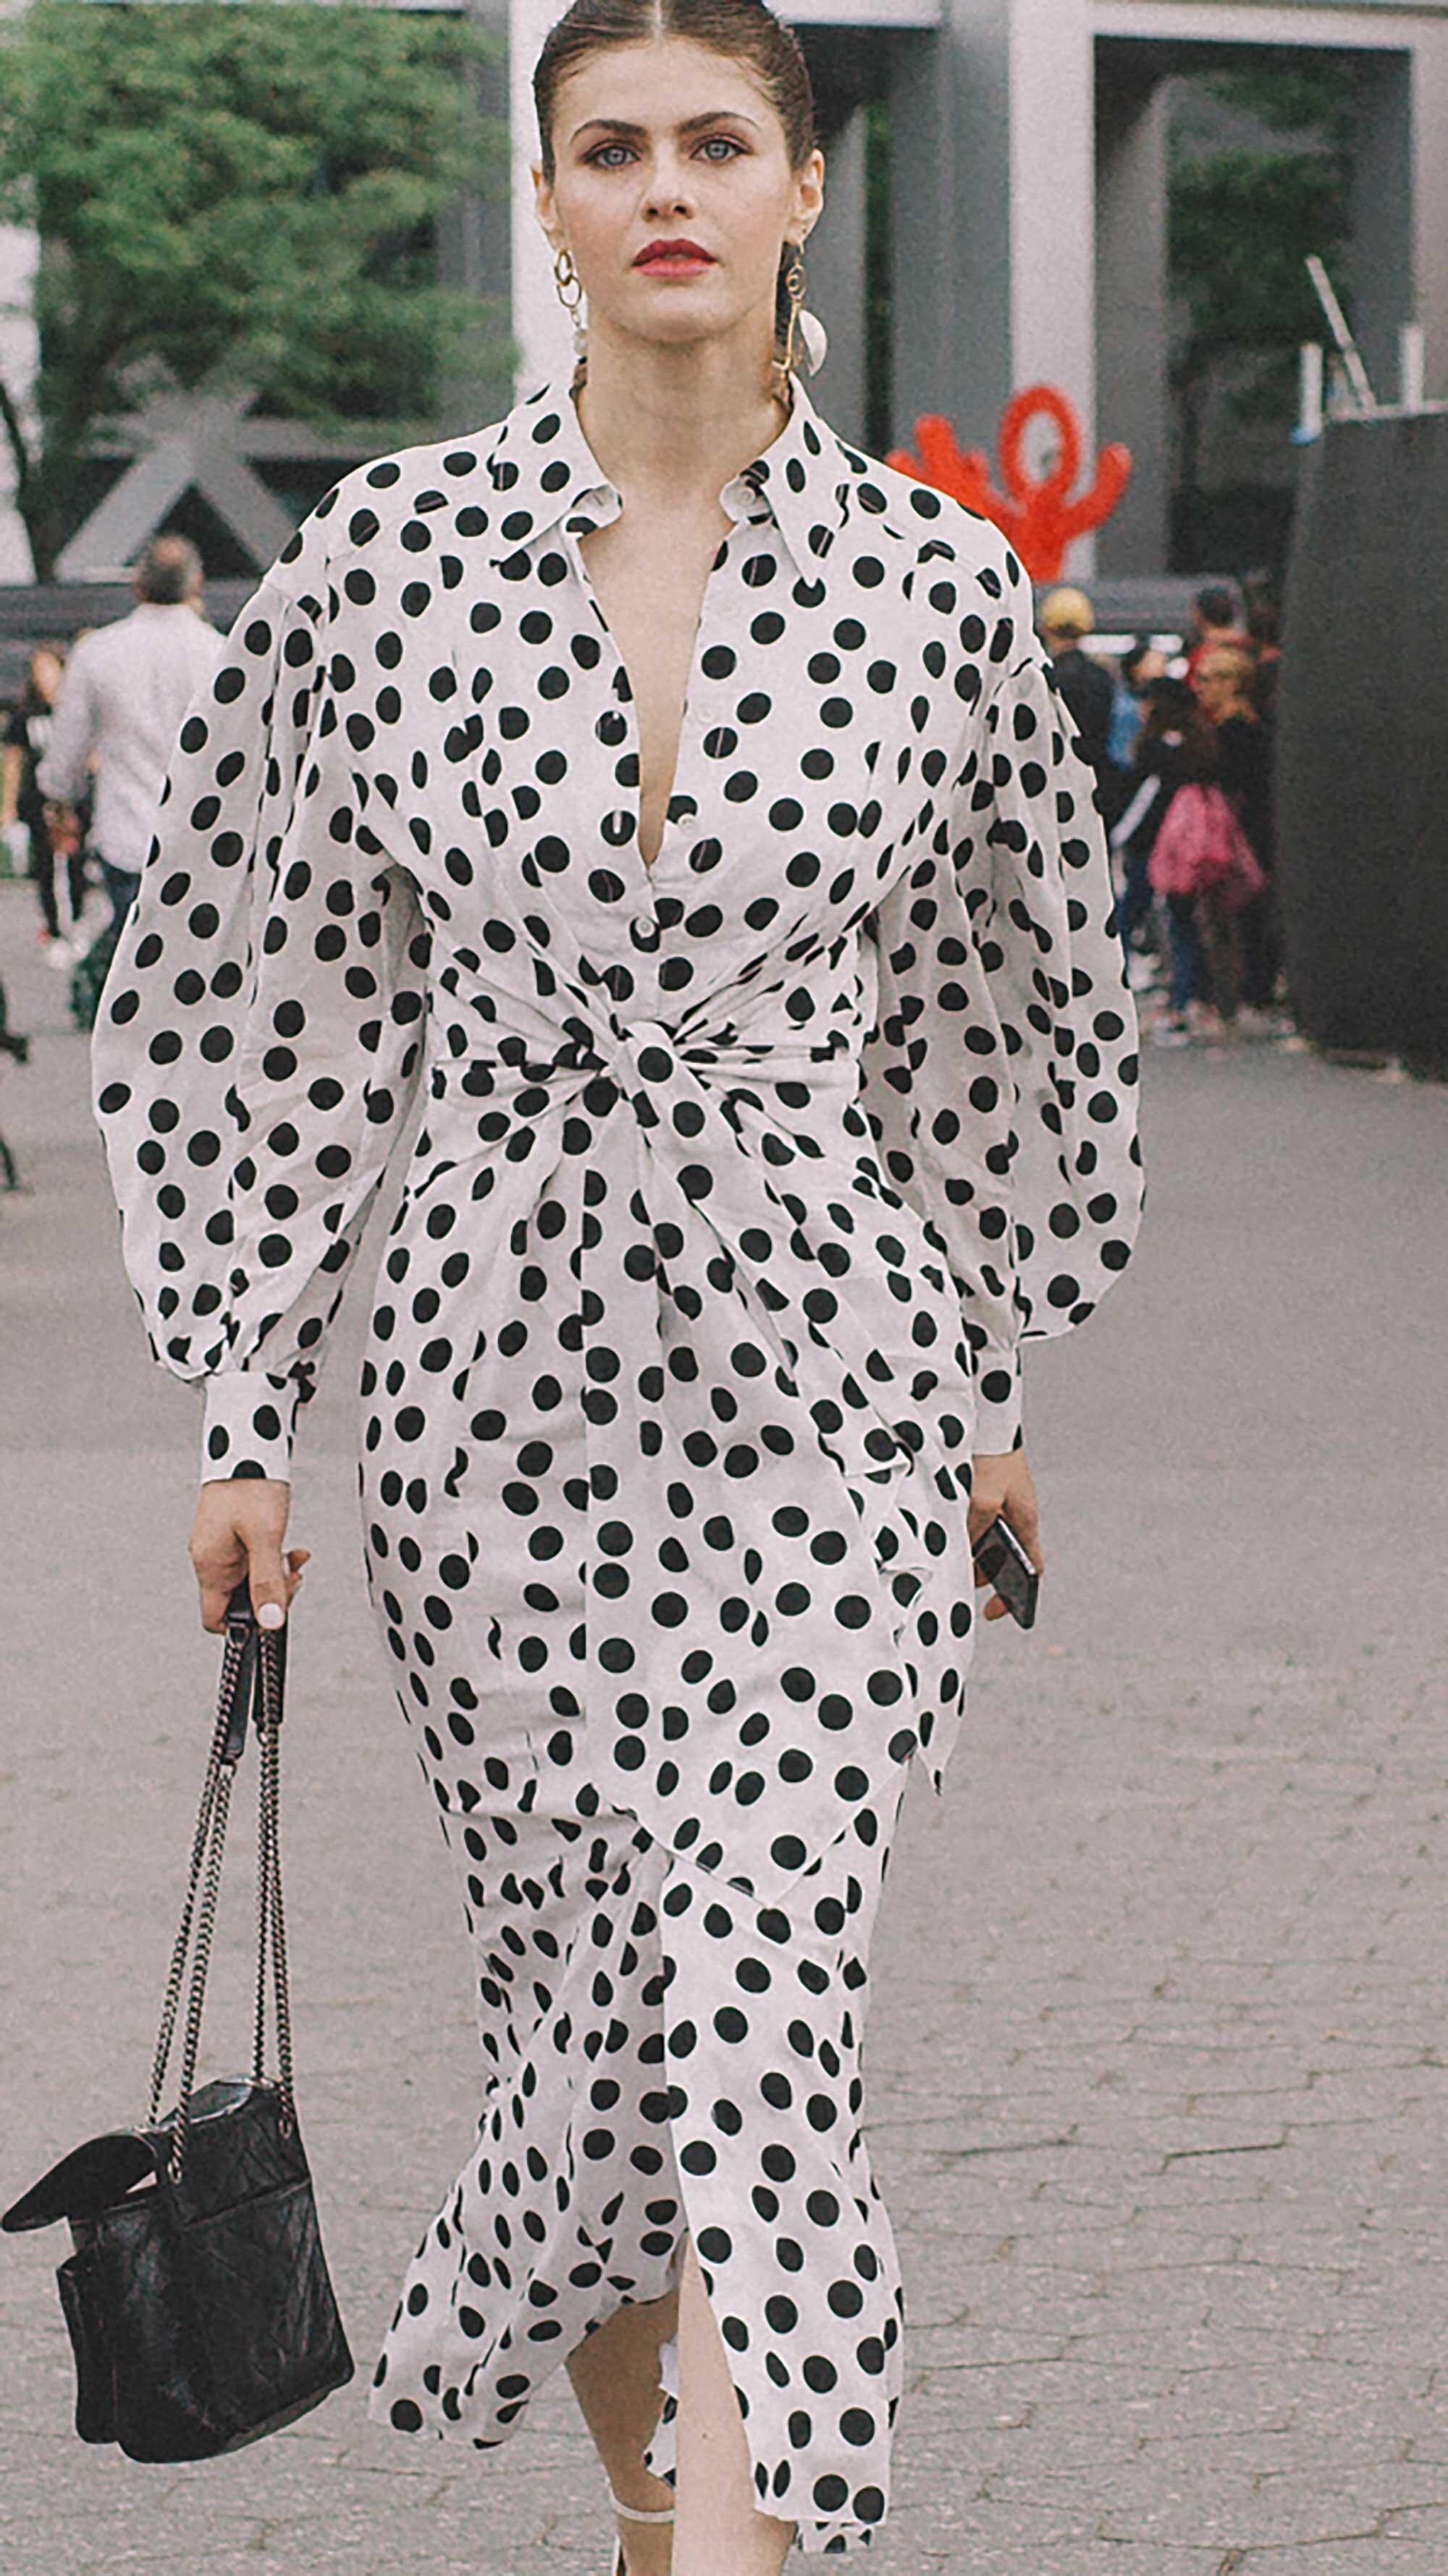 Click for more looks! Best outfits of New York Fashion Week street style 2019 Day Three Photo by @J2martinez Jose J. Martinez www.jmrtnz.com -14.jpg